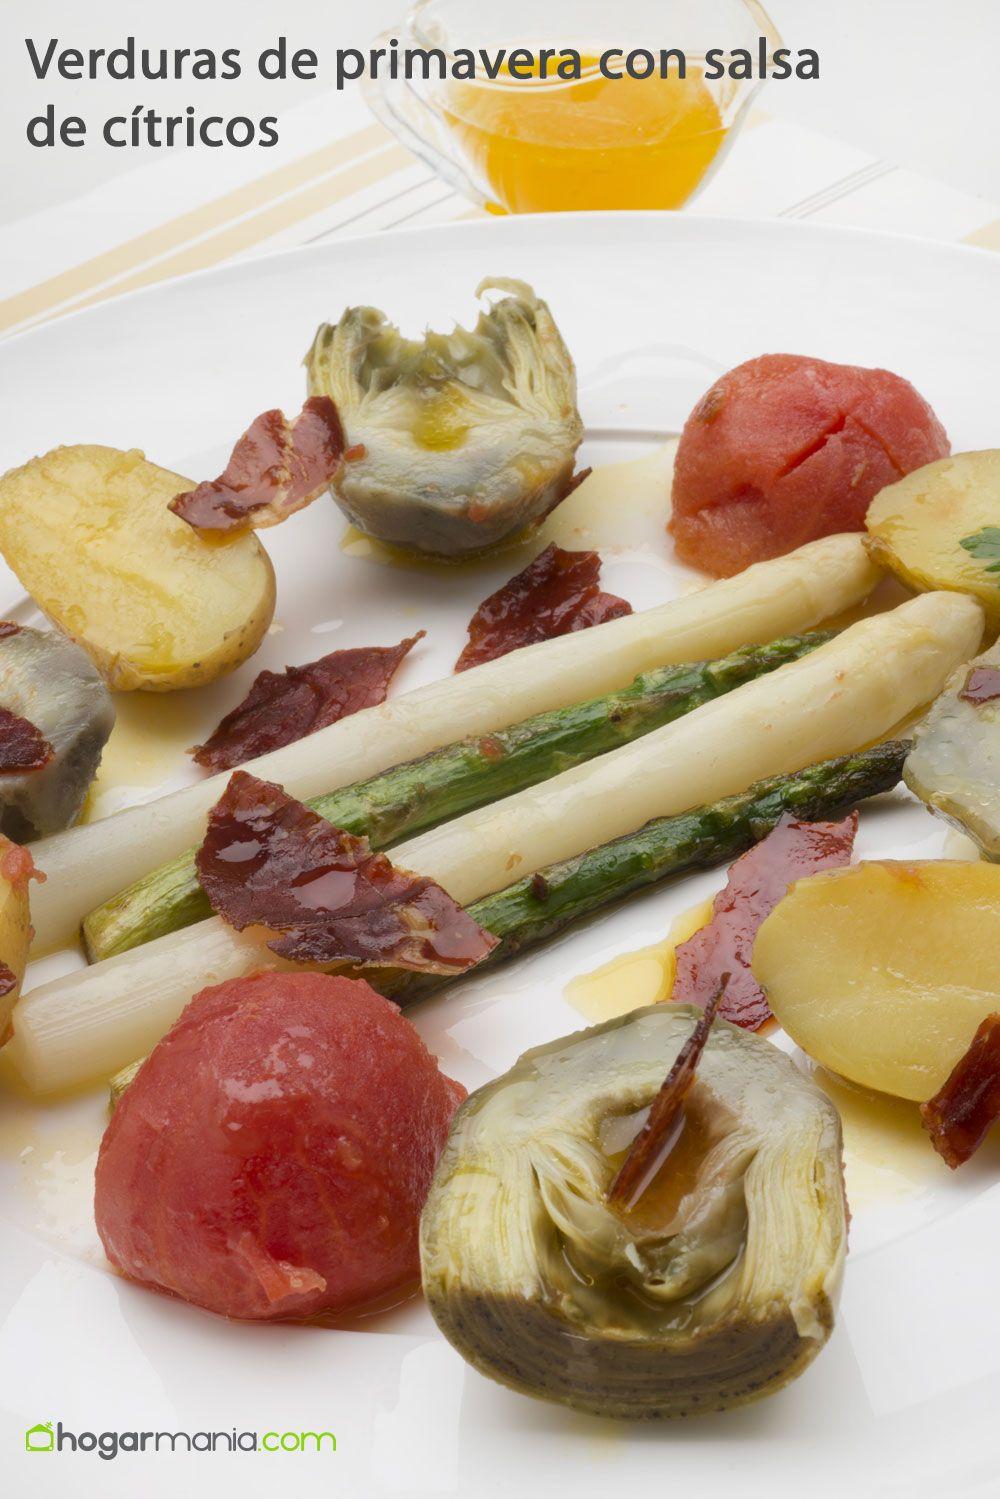 Verduras de primavera con salsa de cítricos